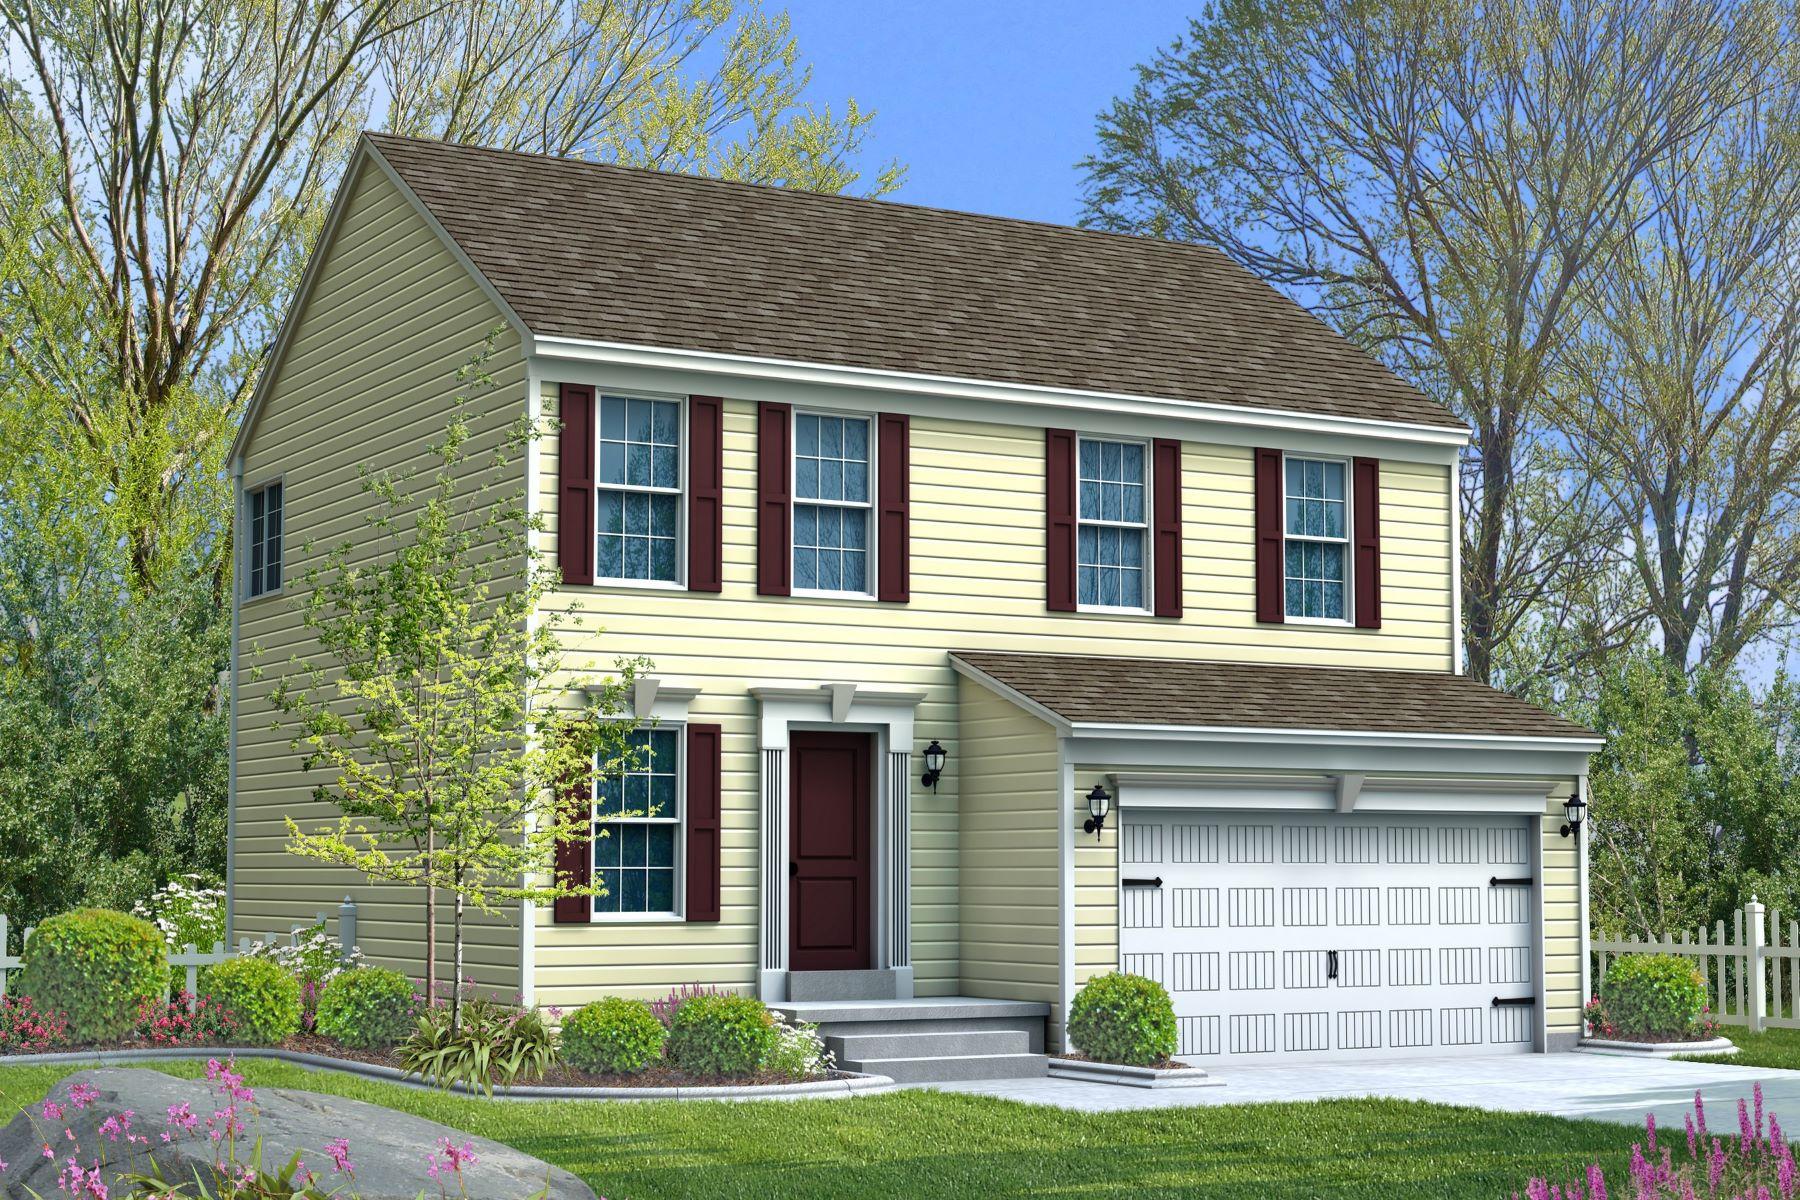 Single Family Homes για την Πώληση στο Lexington Estates Champions Way, The Washington, York Haven, Πενσιλβανια 17370 Ηνωμένες Πολιτείες